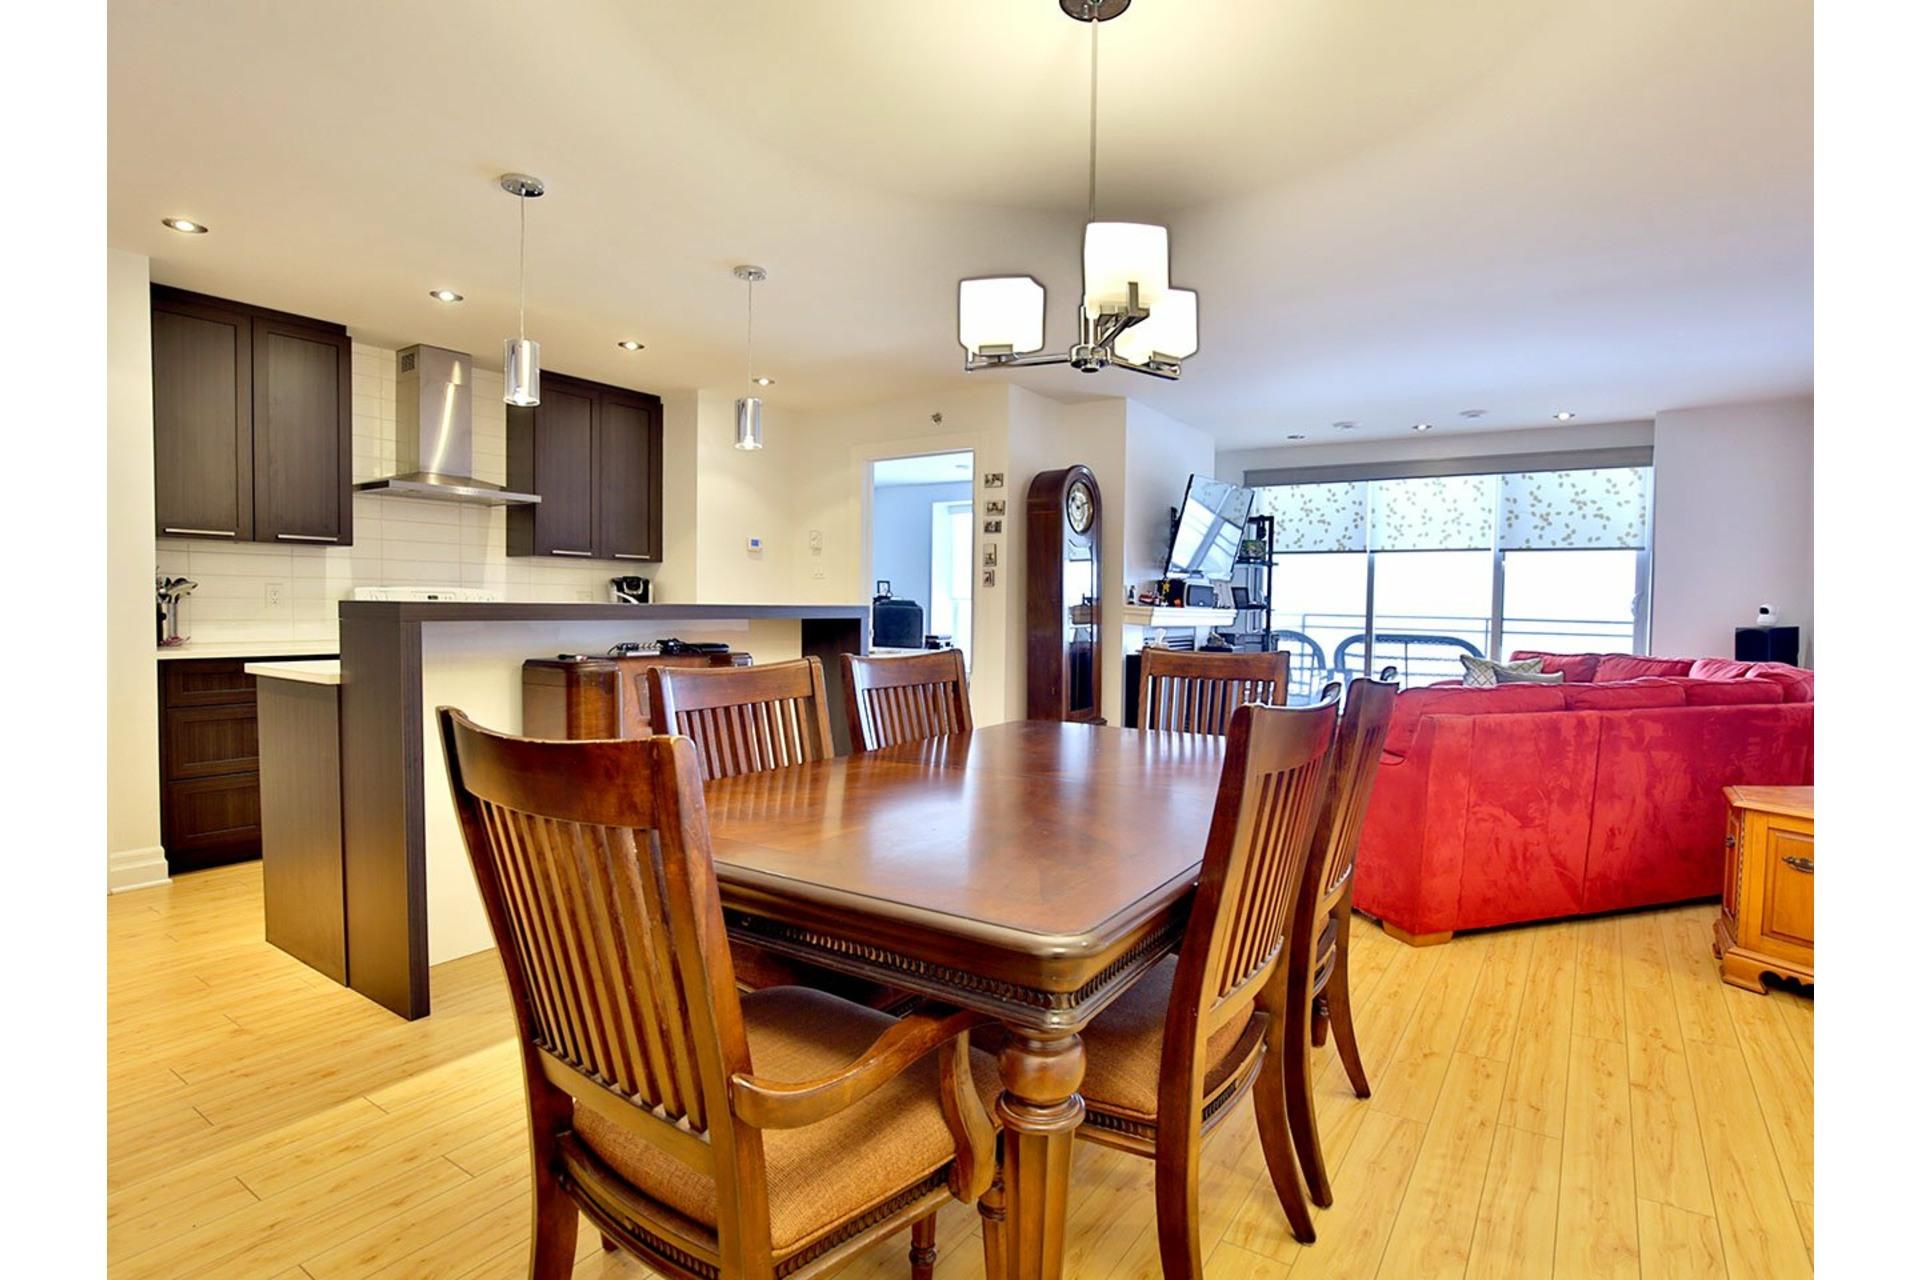 image 8 - Apartment For sale Varennes - 5 rooms